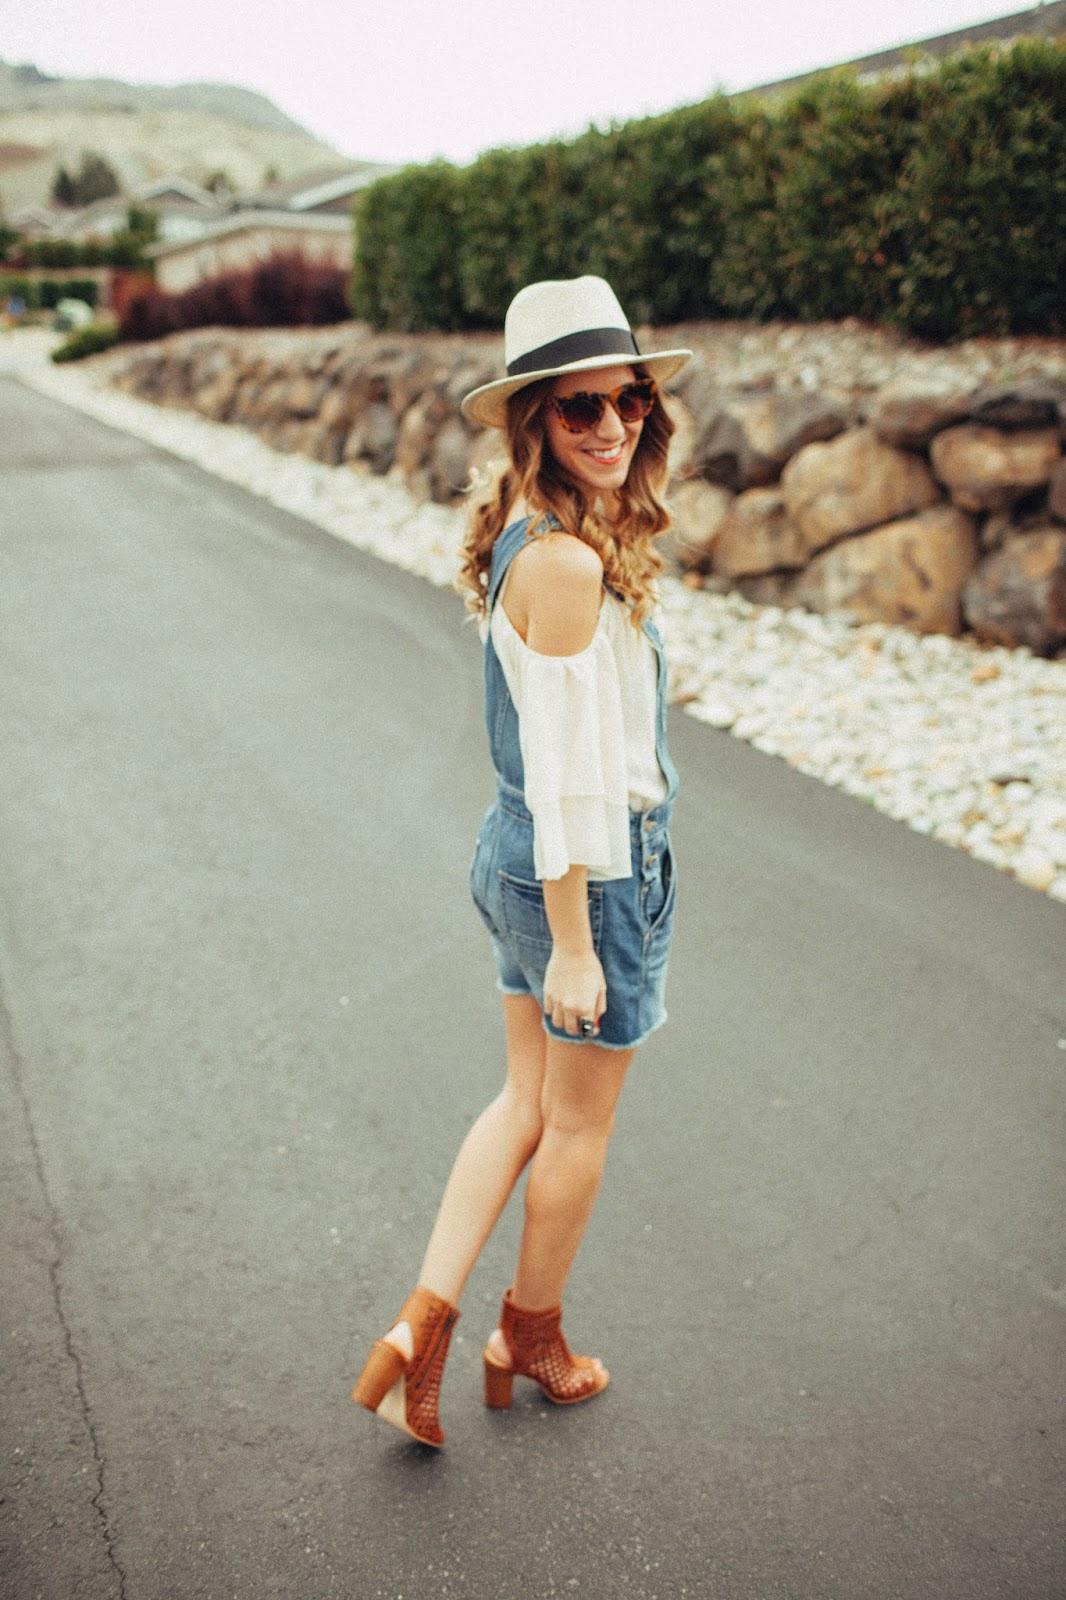 who wears shortalls